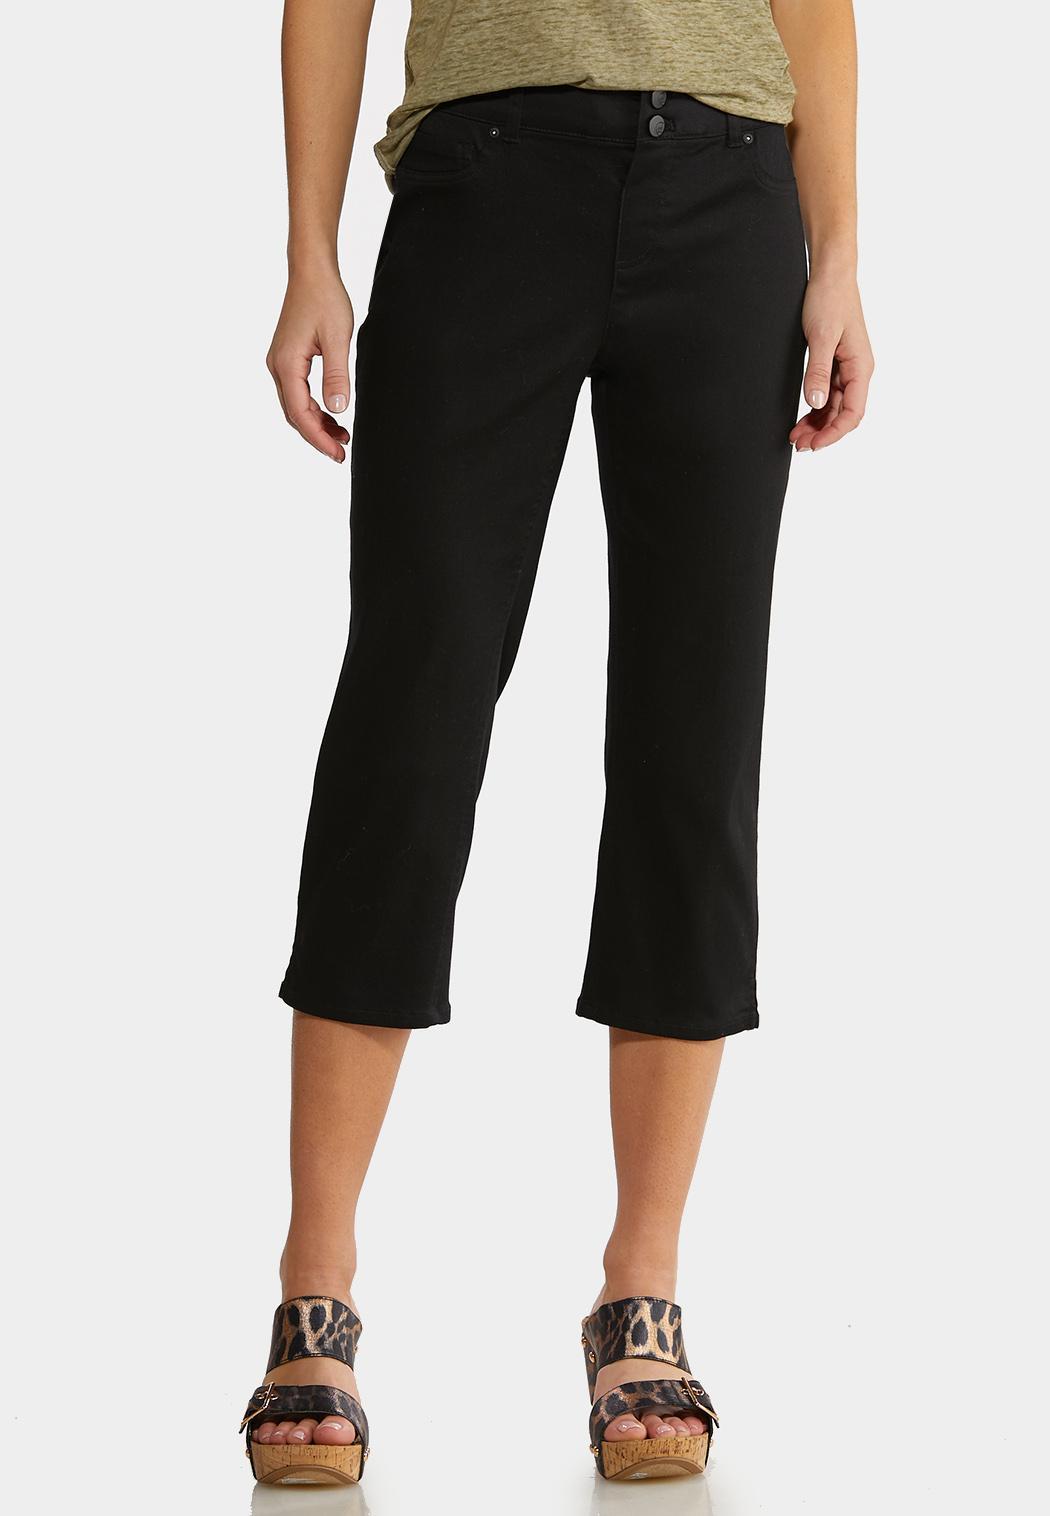 Cropped Black Jeans